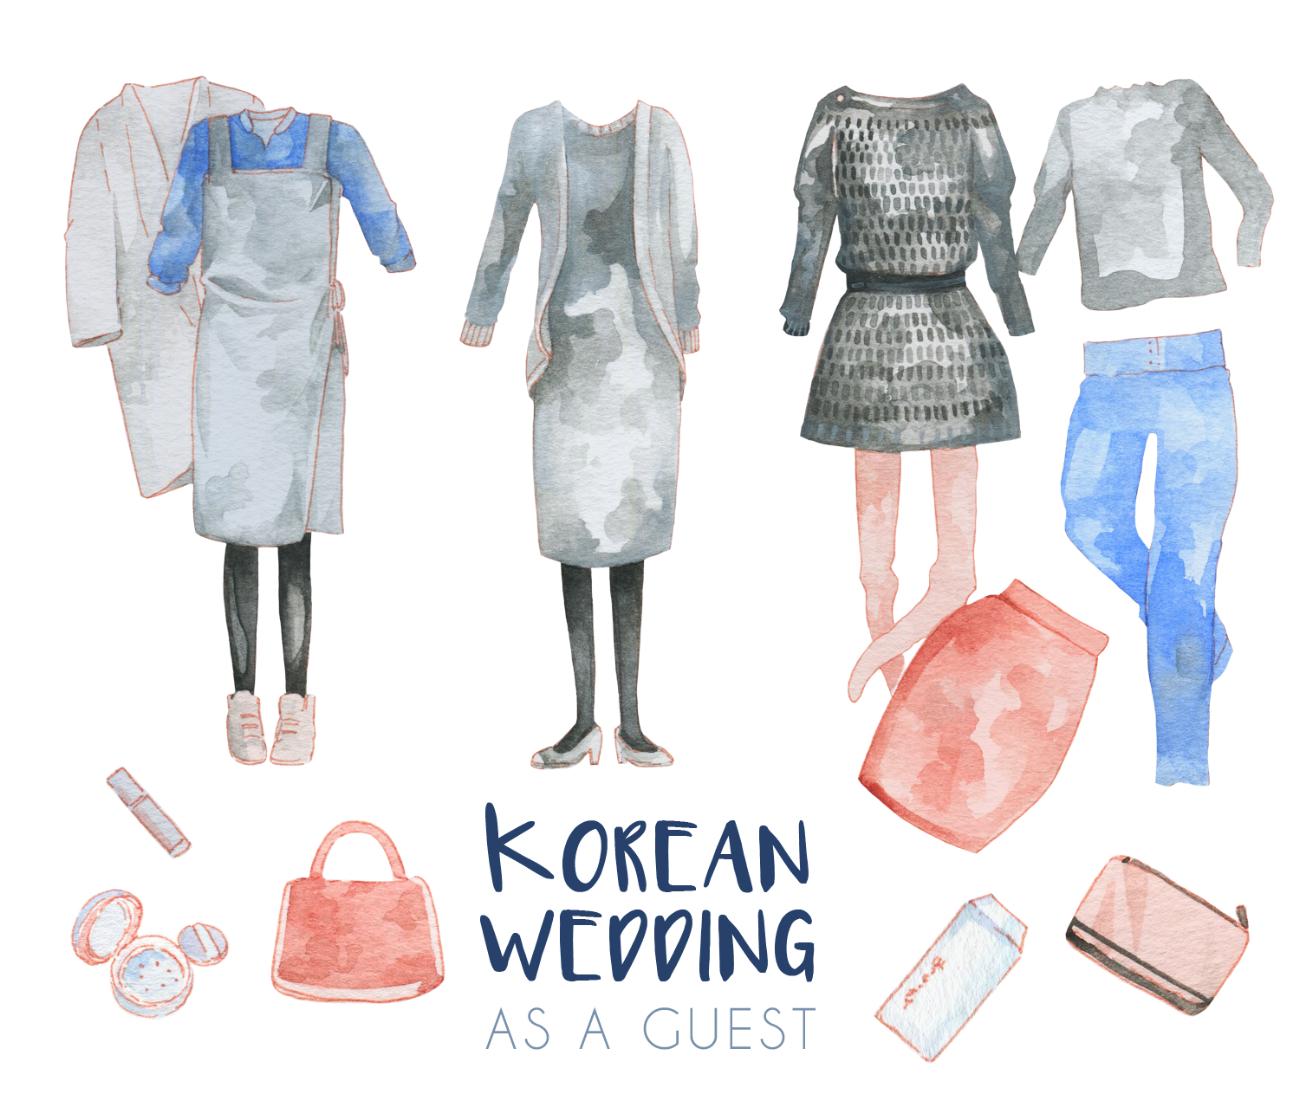 Korean Wedding Guest Dress Code Etiquette Illustration Evydraws,Casual Dress For A Wedding